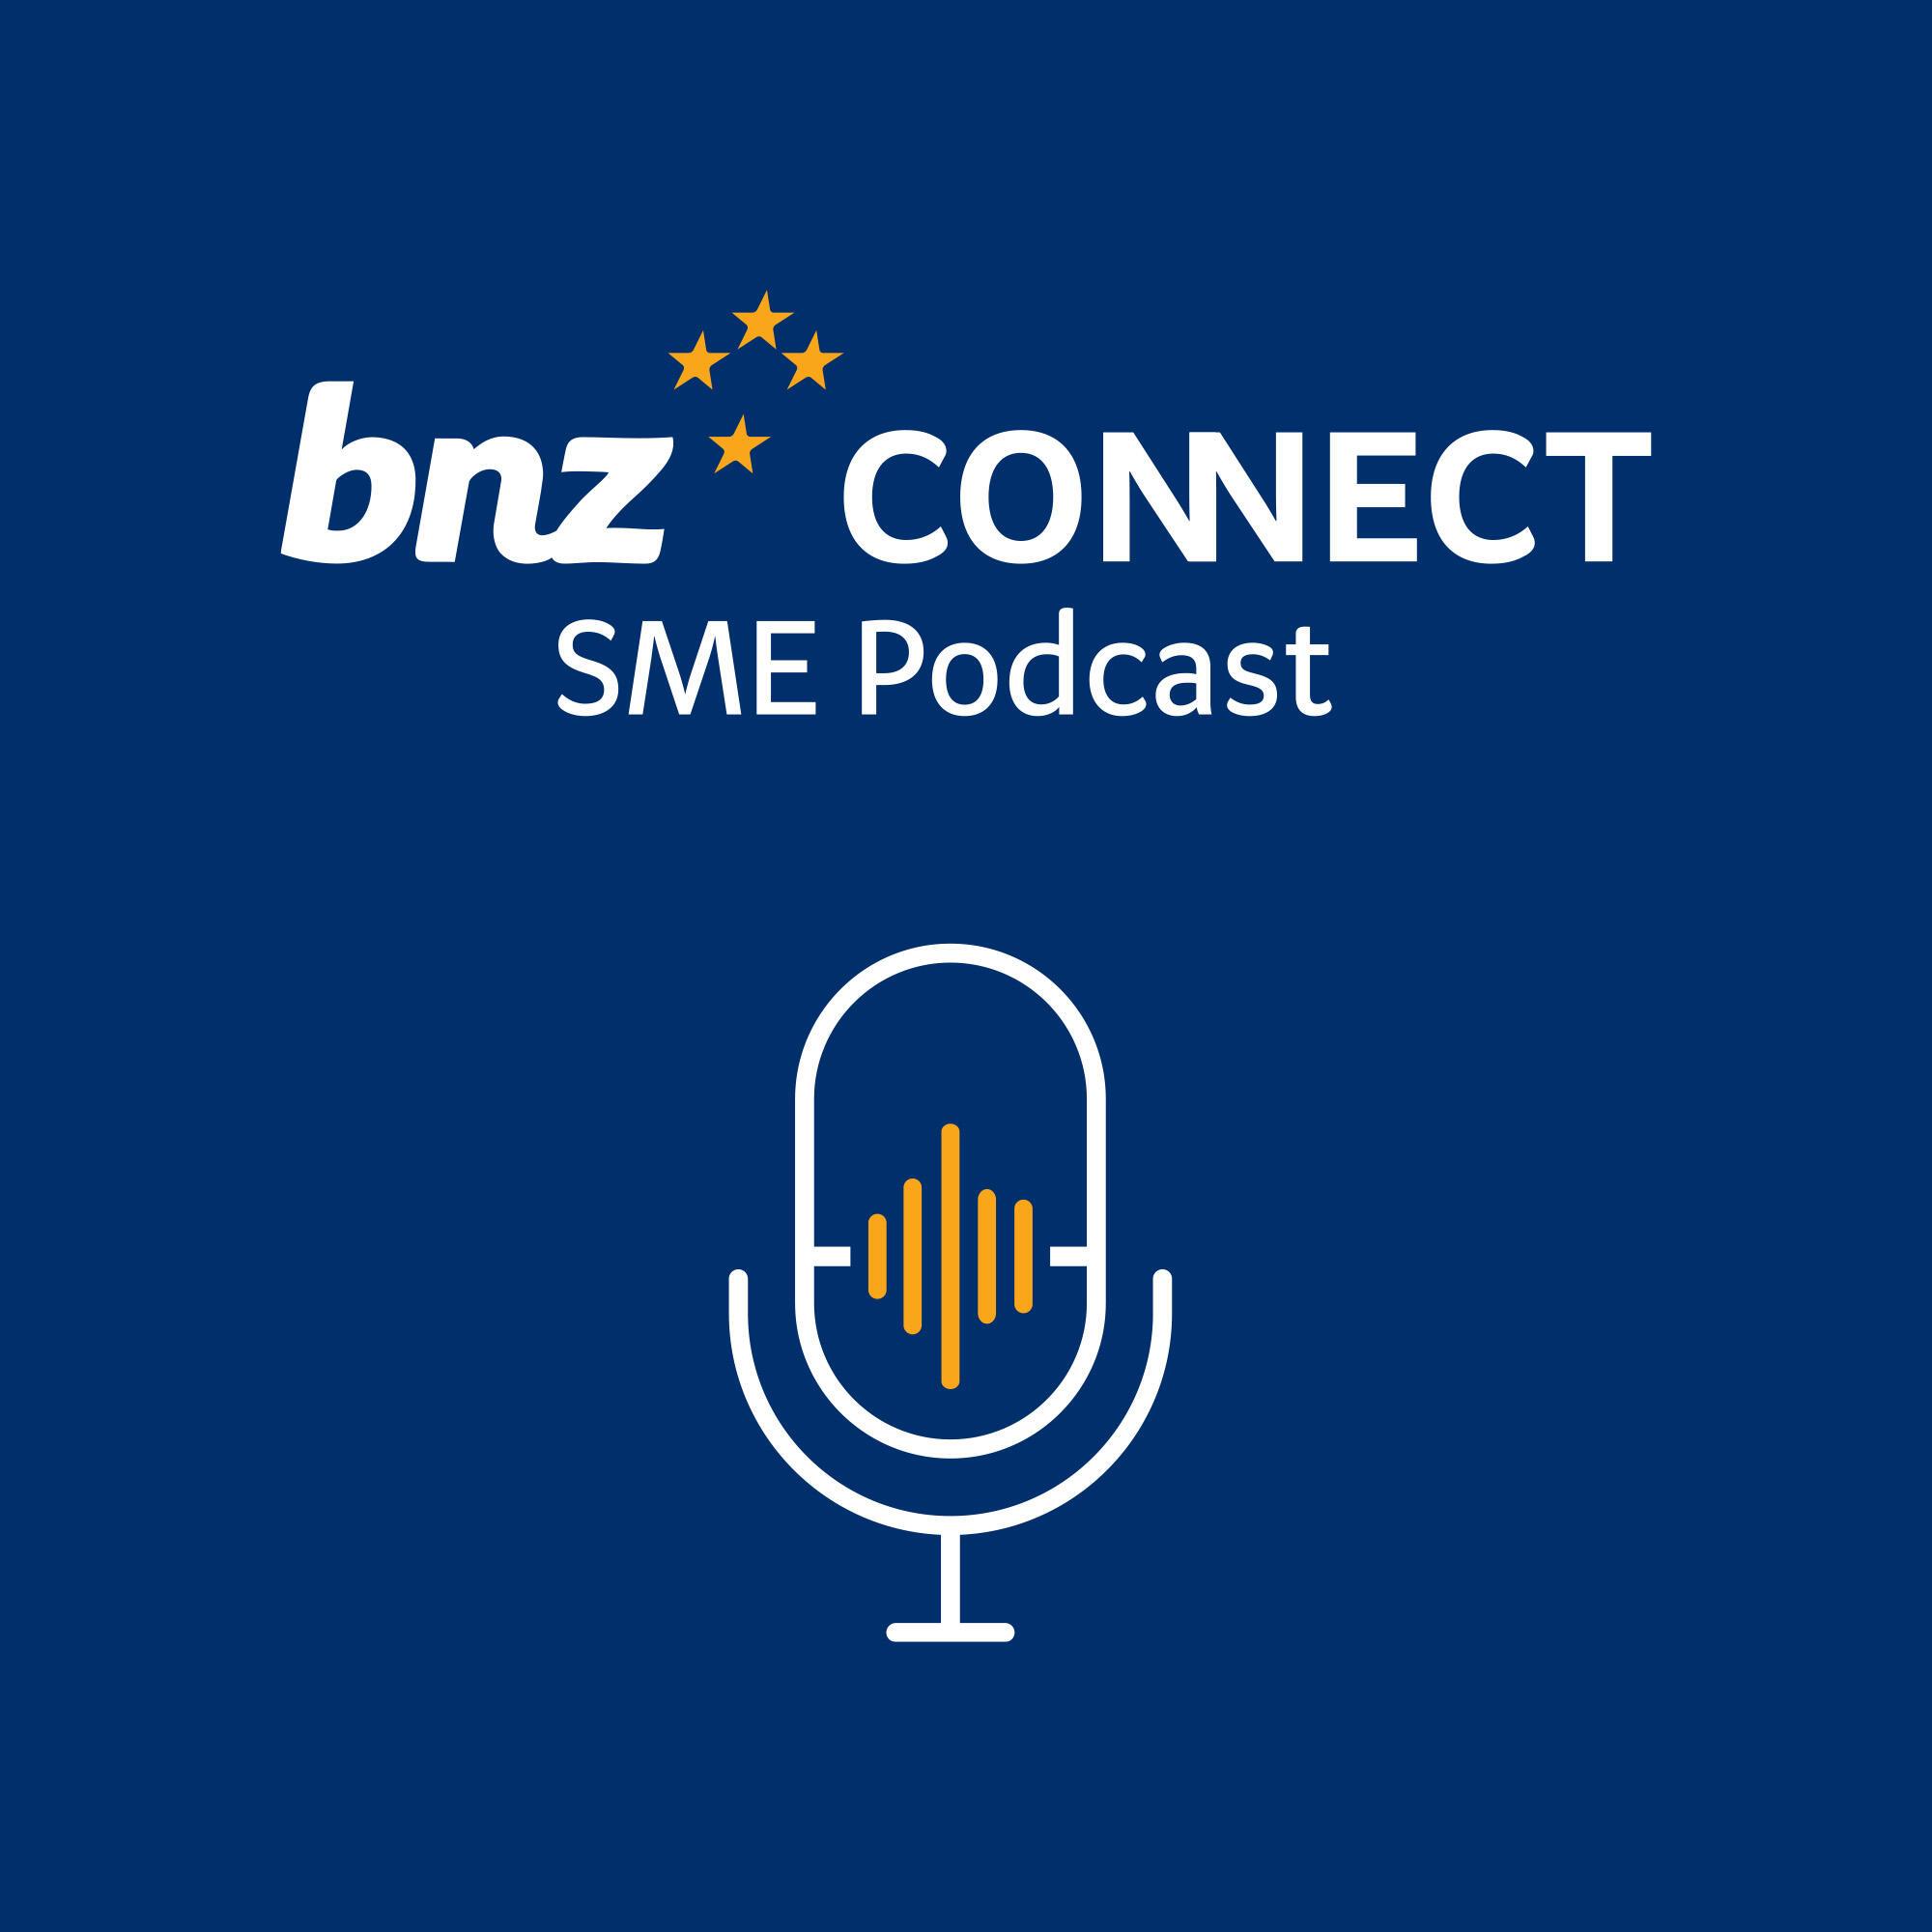 BNZ Connect SME Podcast